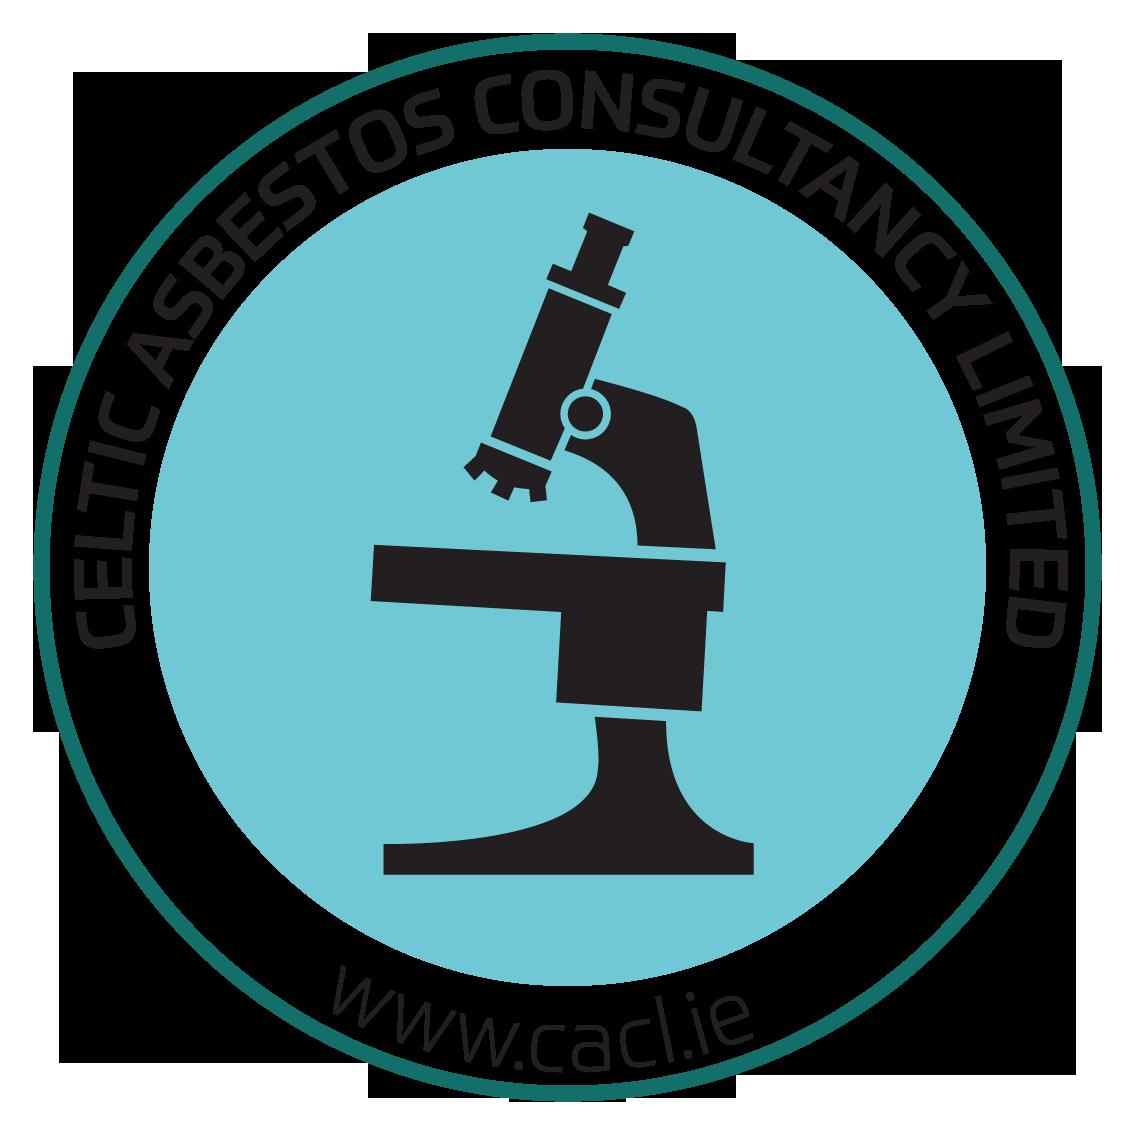 Celtic Asbestos Consultancy Surveys Ireland